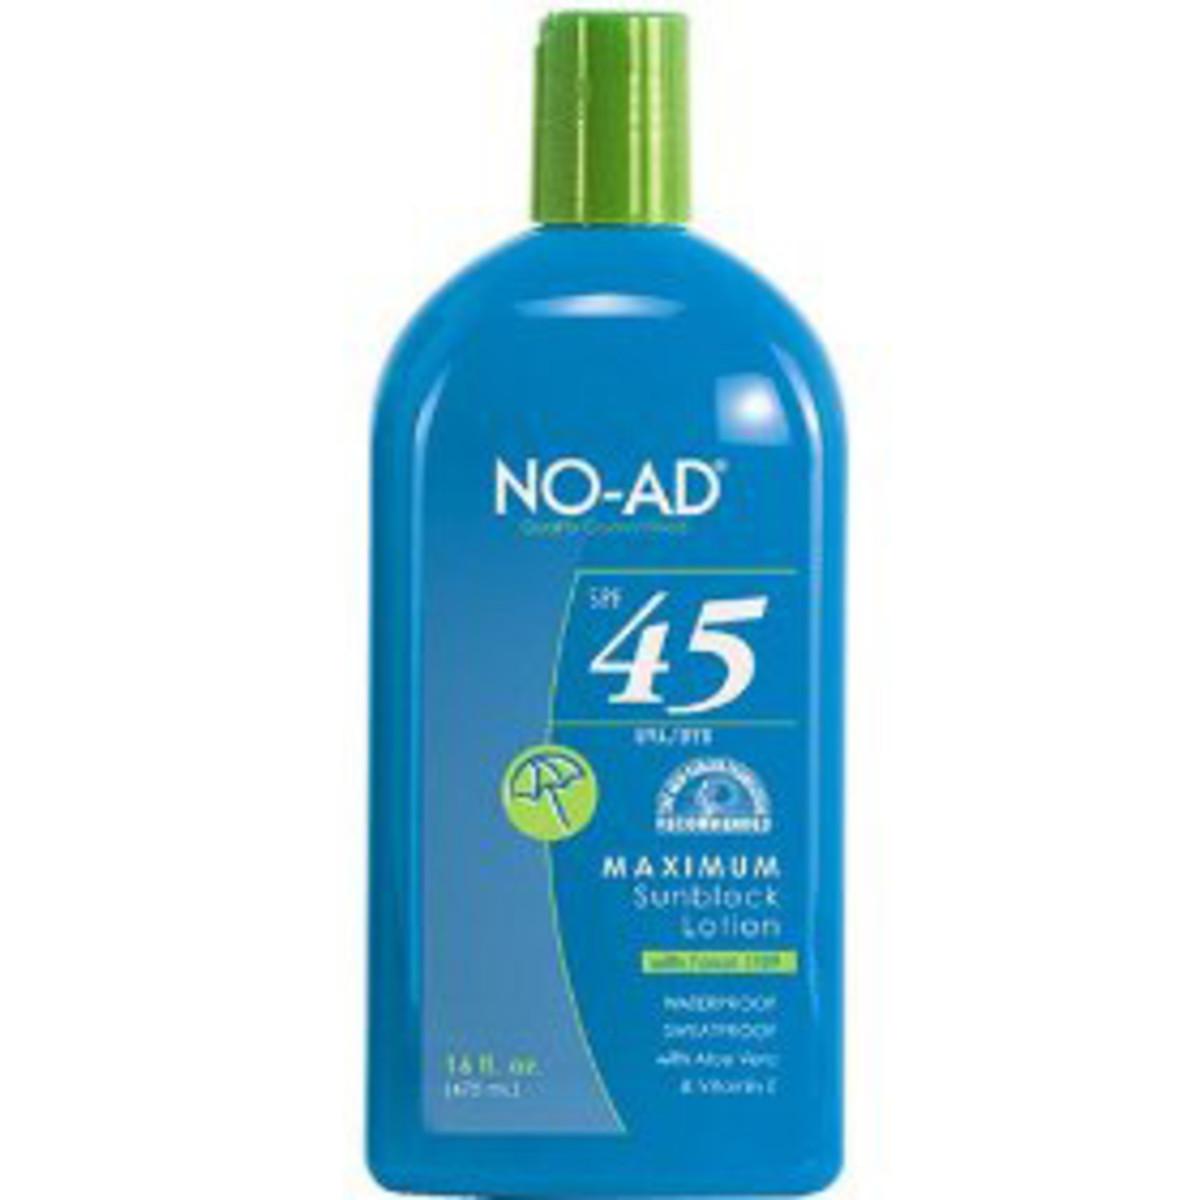 NO-AD Sunscreen